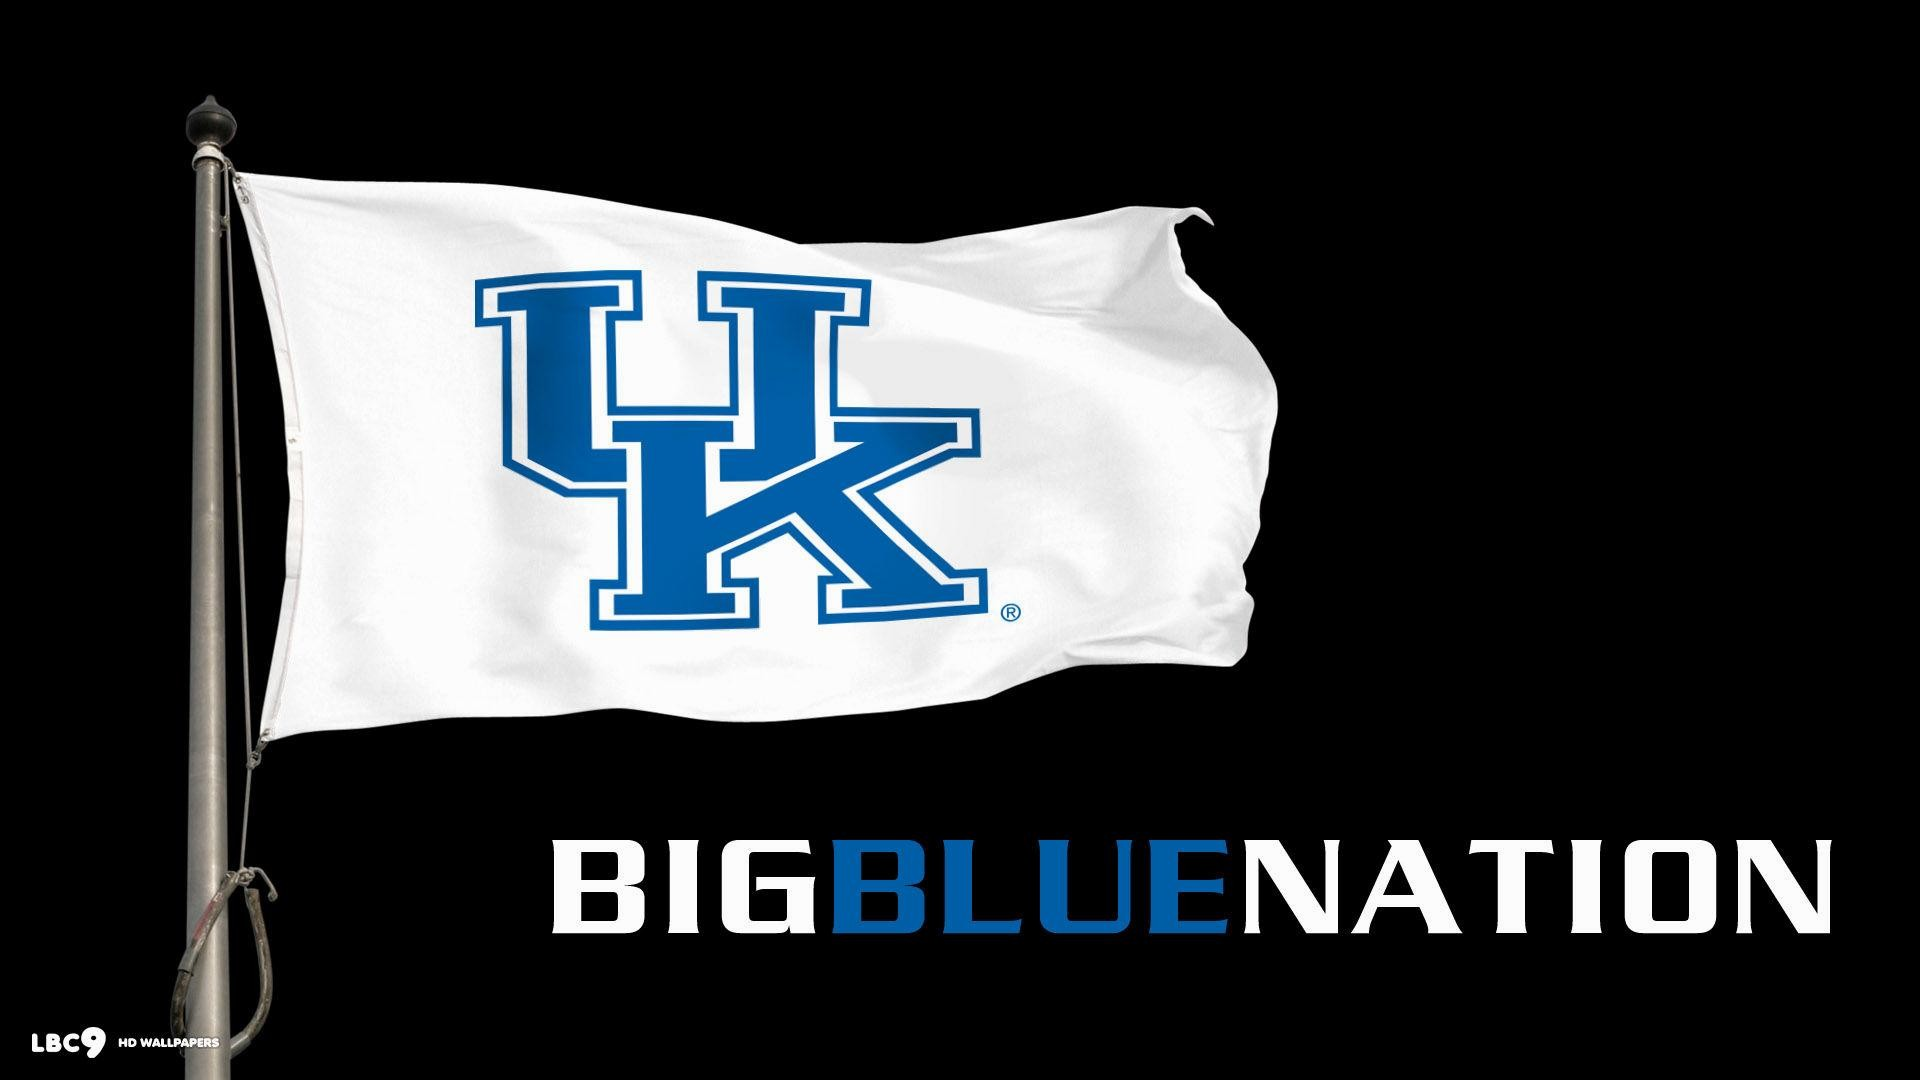 University Of Kentucky Basketball Wallpapers Group 1920×1080 Kentucky  Wildcats Wallpapers (29 Wallpapers)